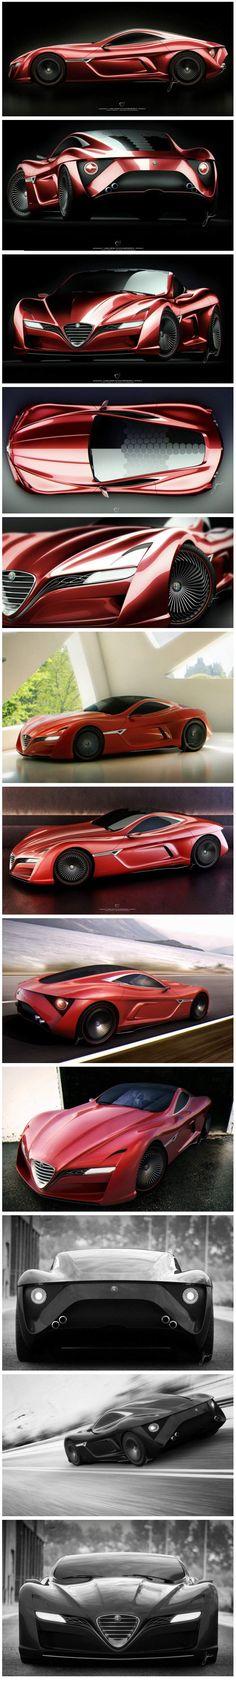 Alfa Romeo C12 GTS concept by Ugur Sahin